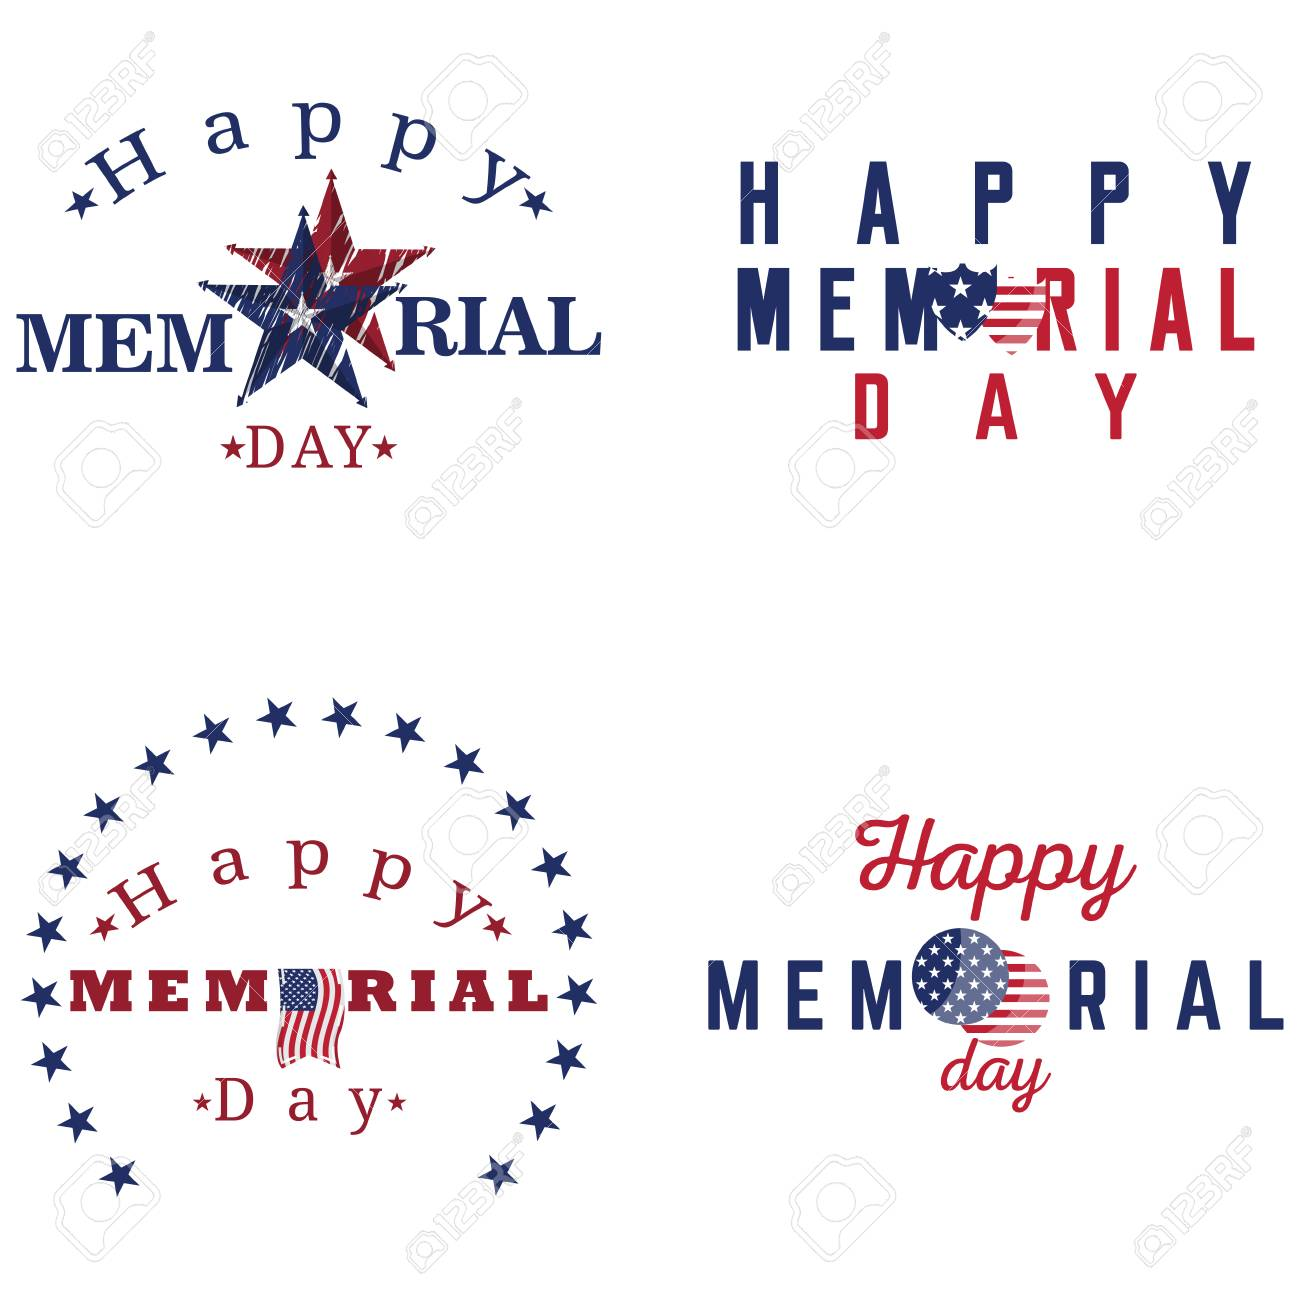 Memorial Day Sale discount labels vector illustration